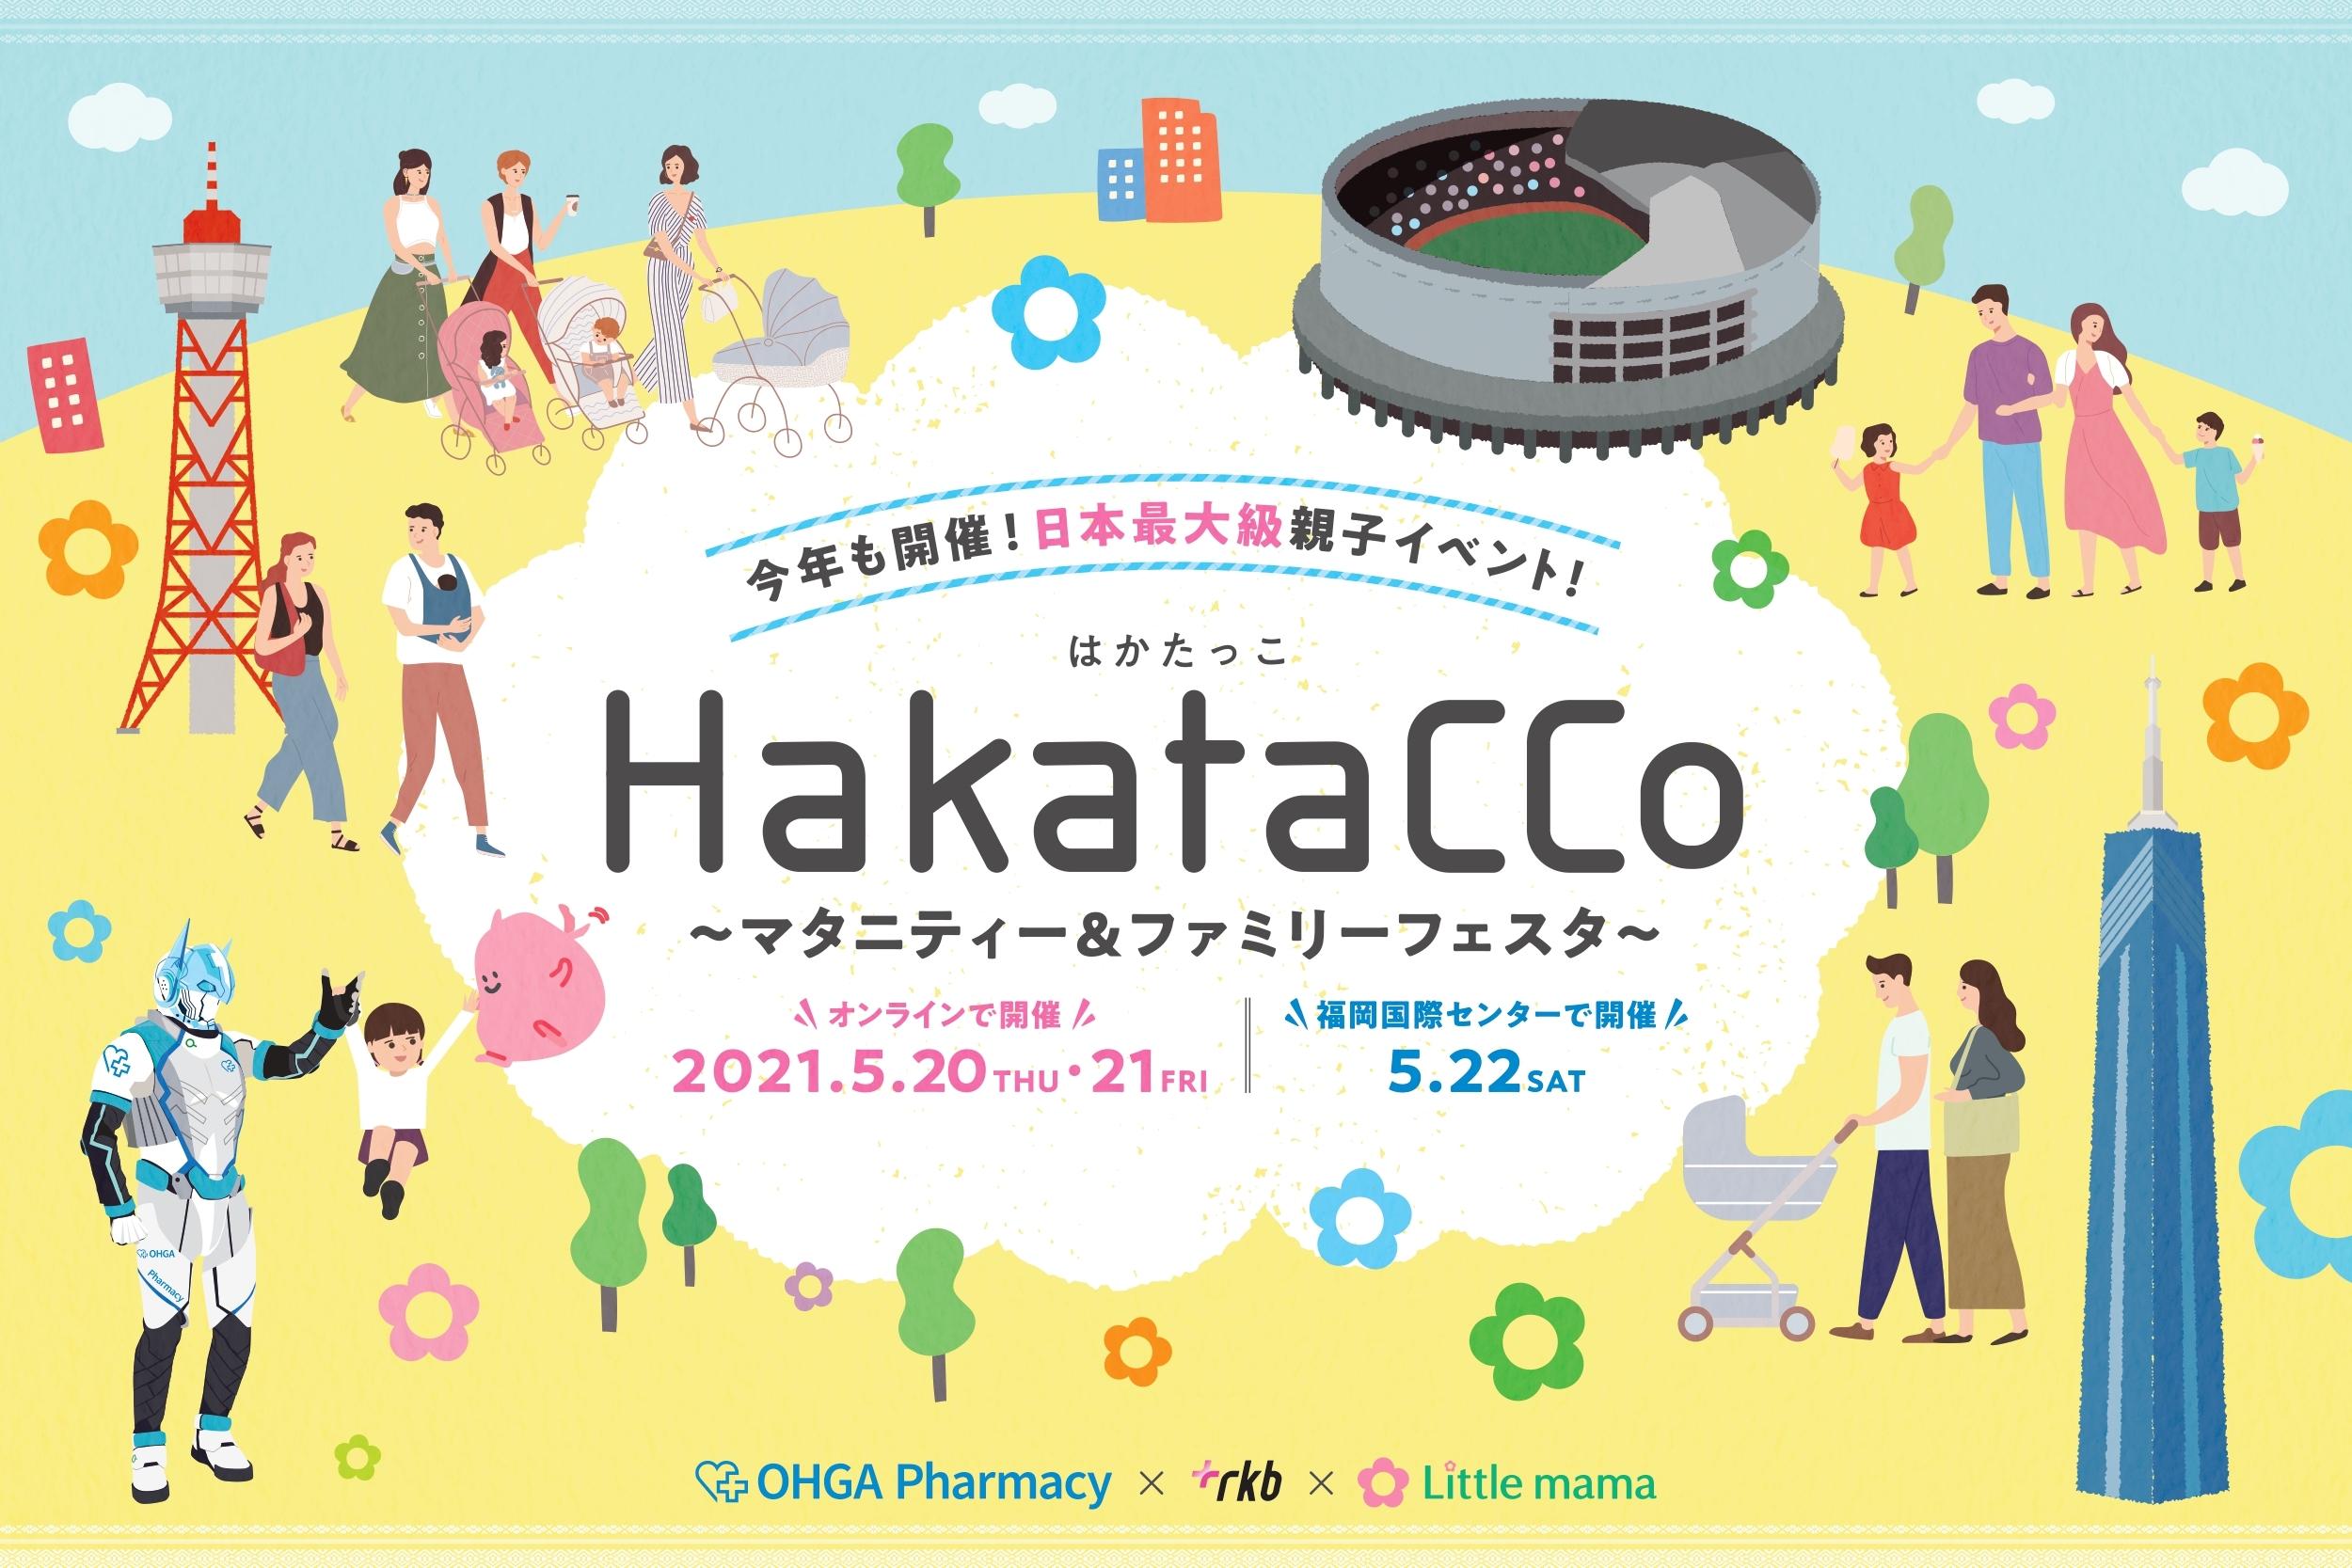 HakataCCo(ハカタッコ)~マタニティ&ファミリーフェスタ~